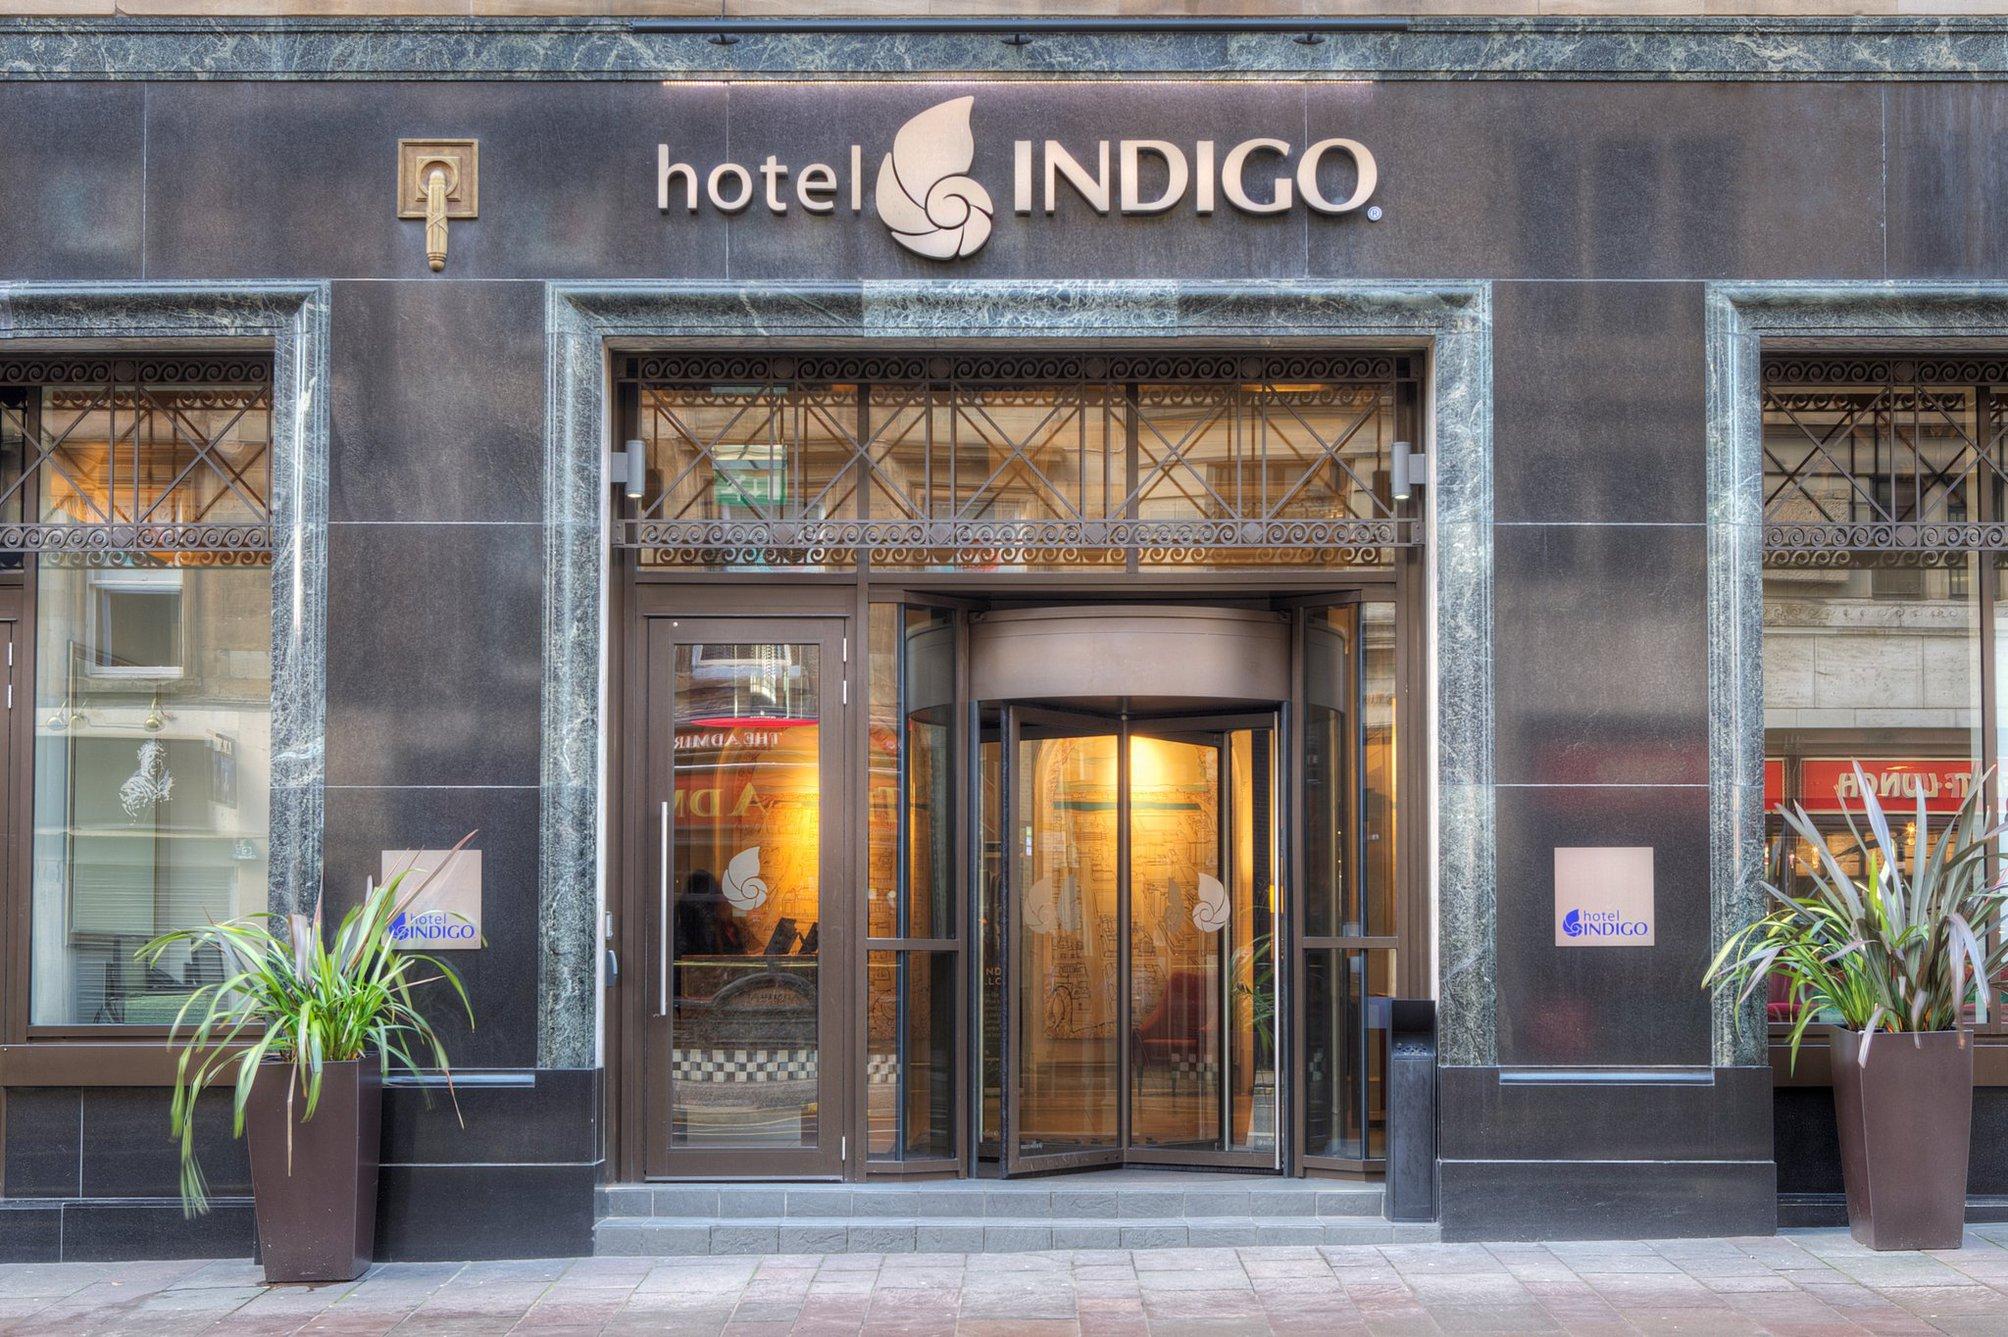 Hotel Indigo Glasgow Hotel Glasgow From 163 90 Lastminute Com